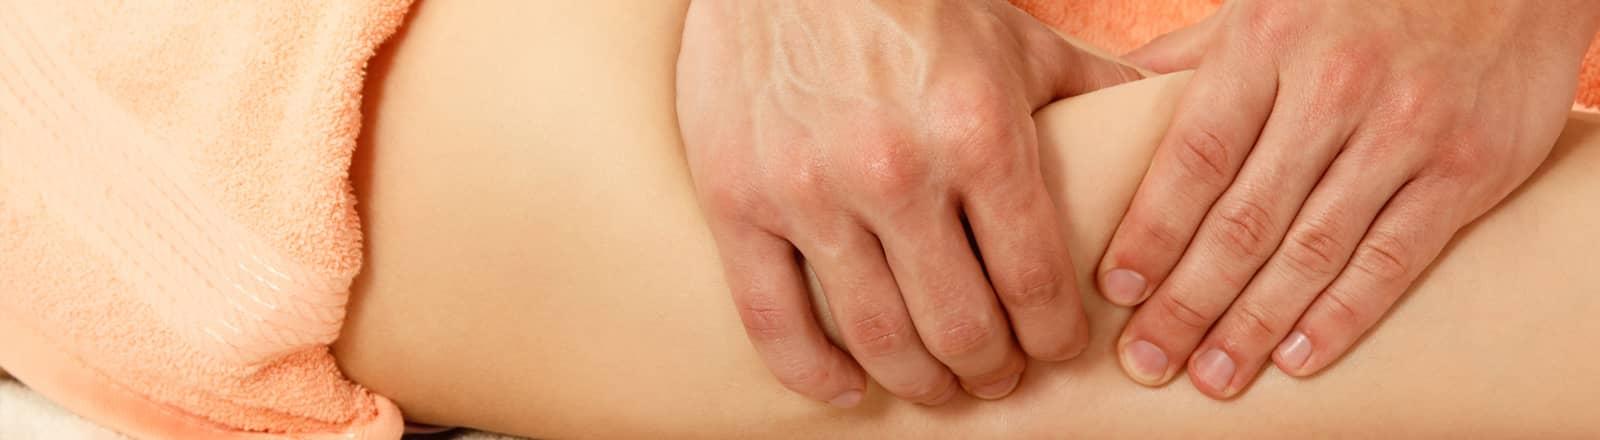 descarga de piernas masaje